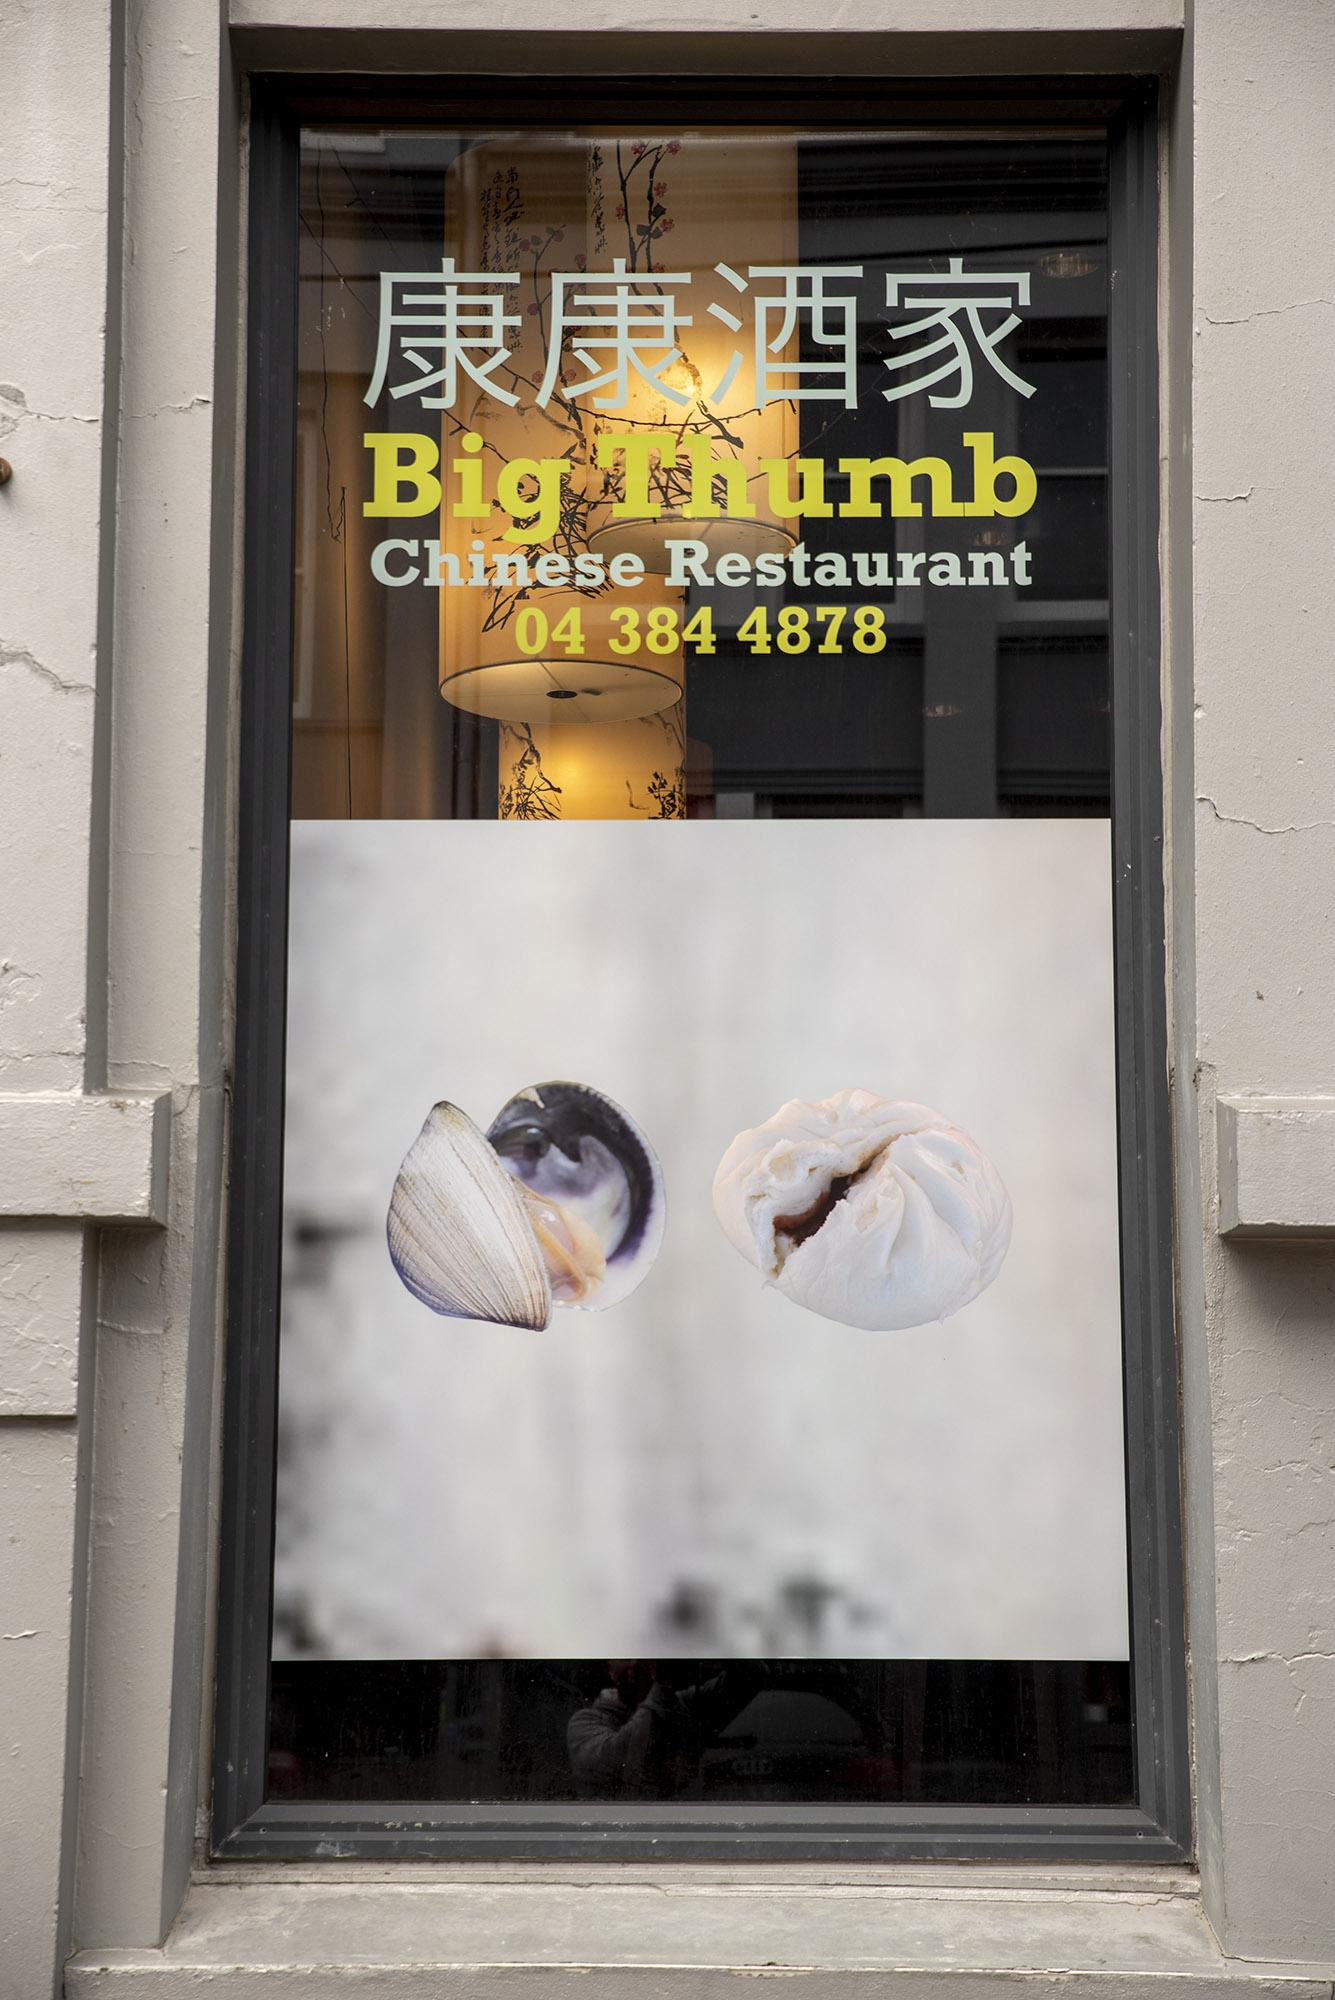 Eat My Culture: Simon Kaan 'kaihaukai' at Big Thumb, Allen Street, September 2018. Photo by John Lake